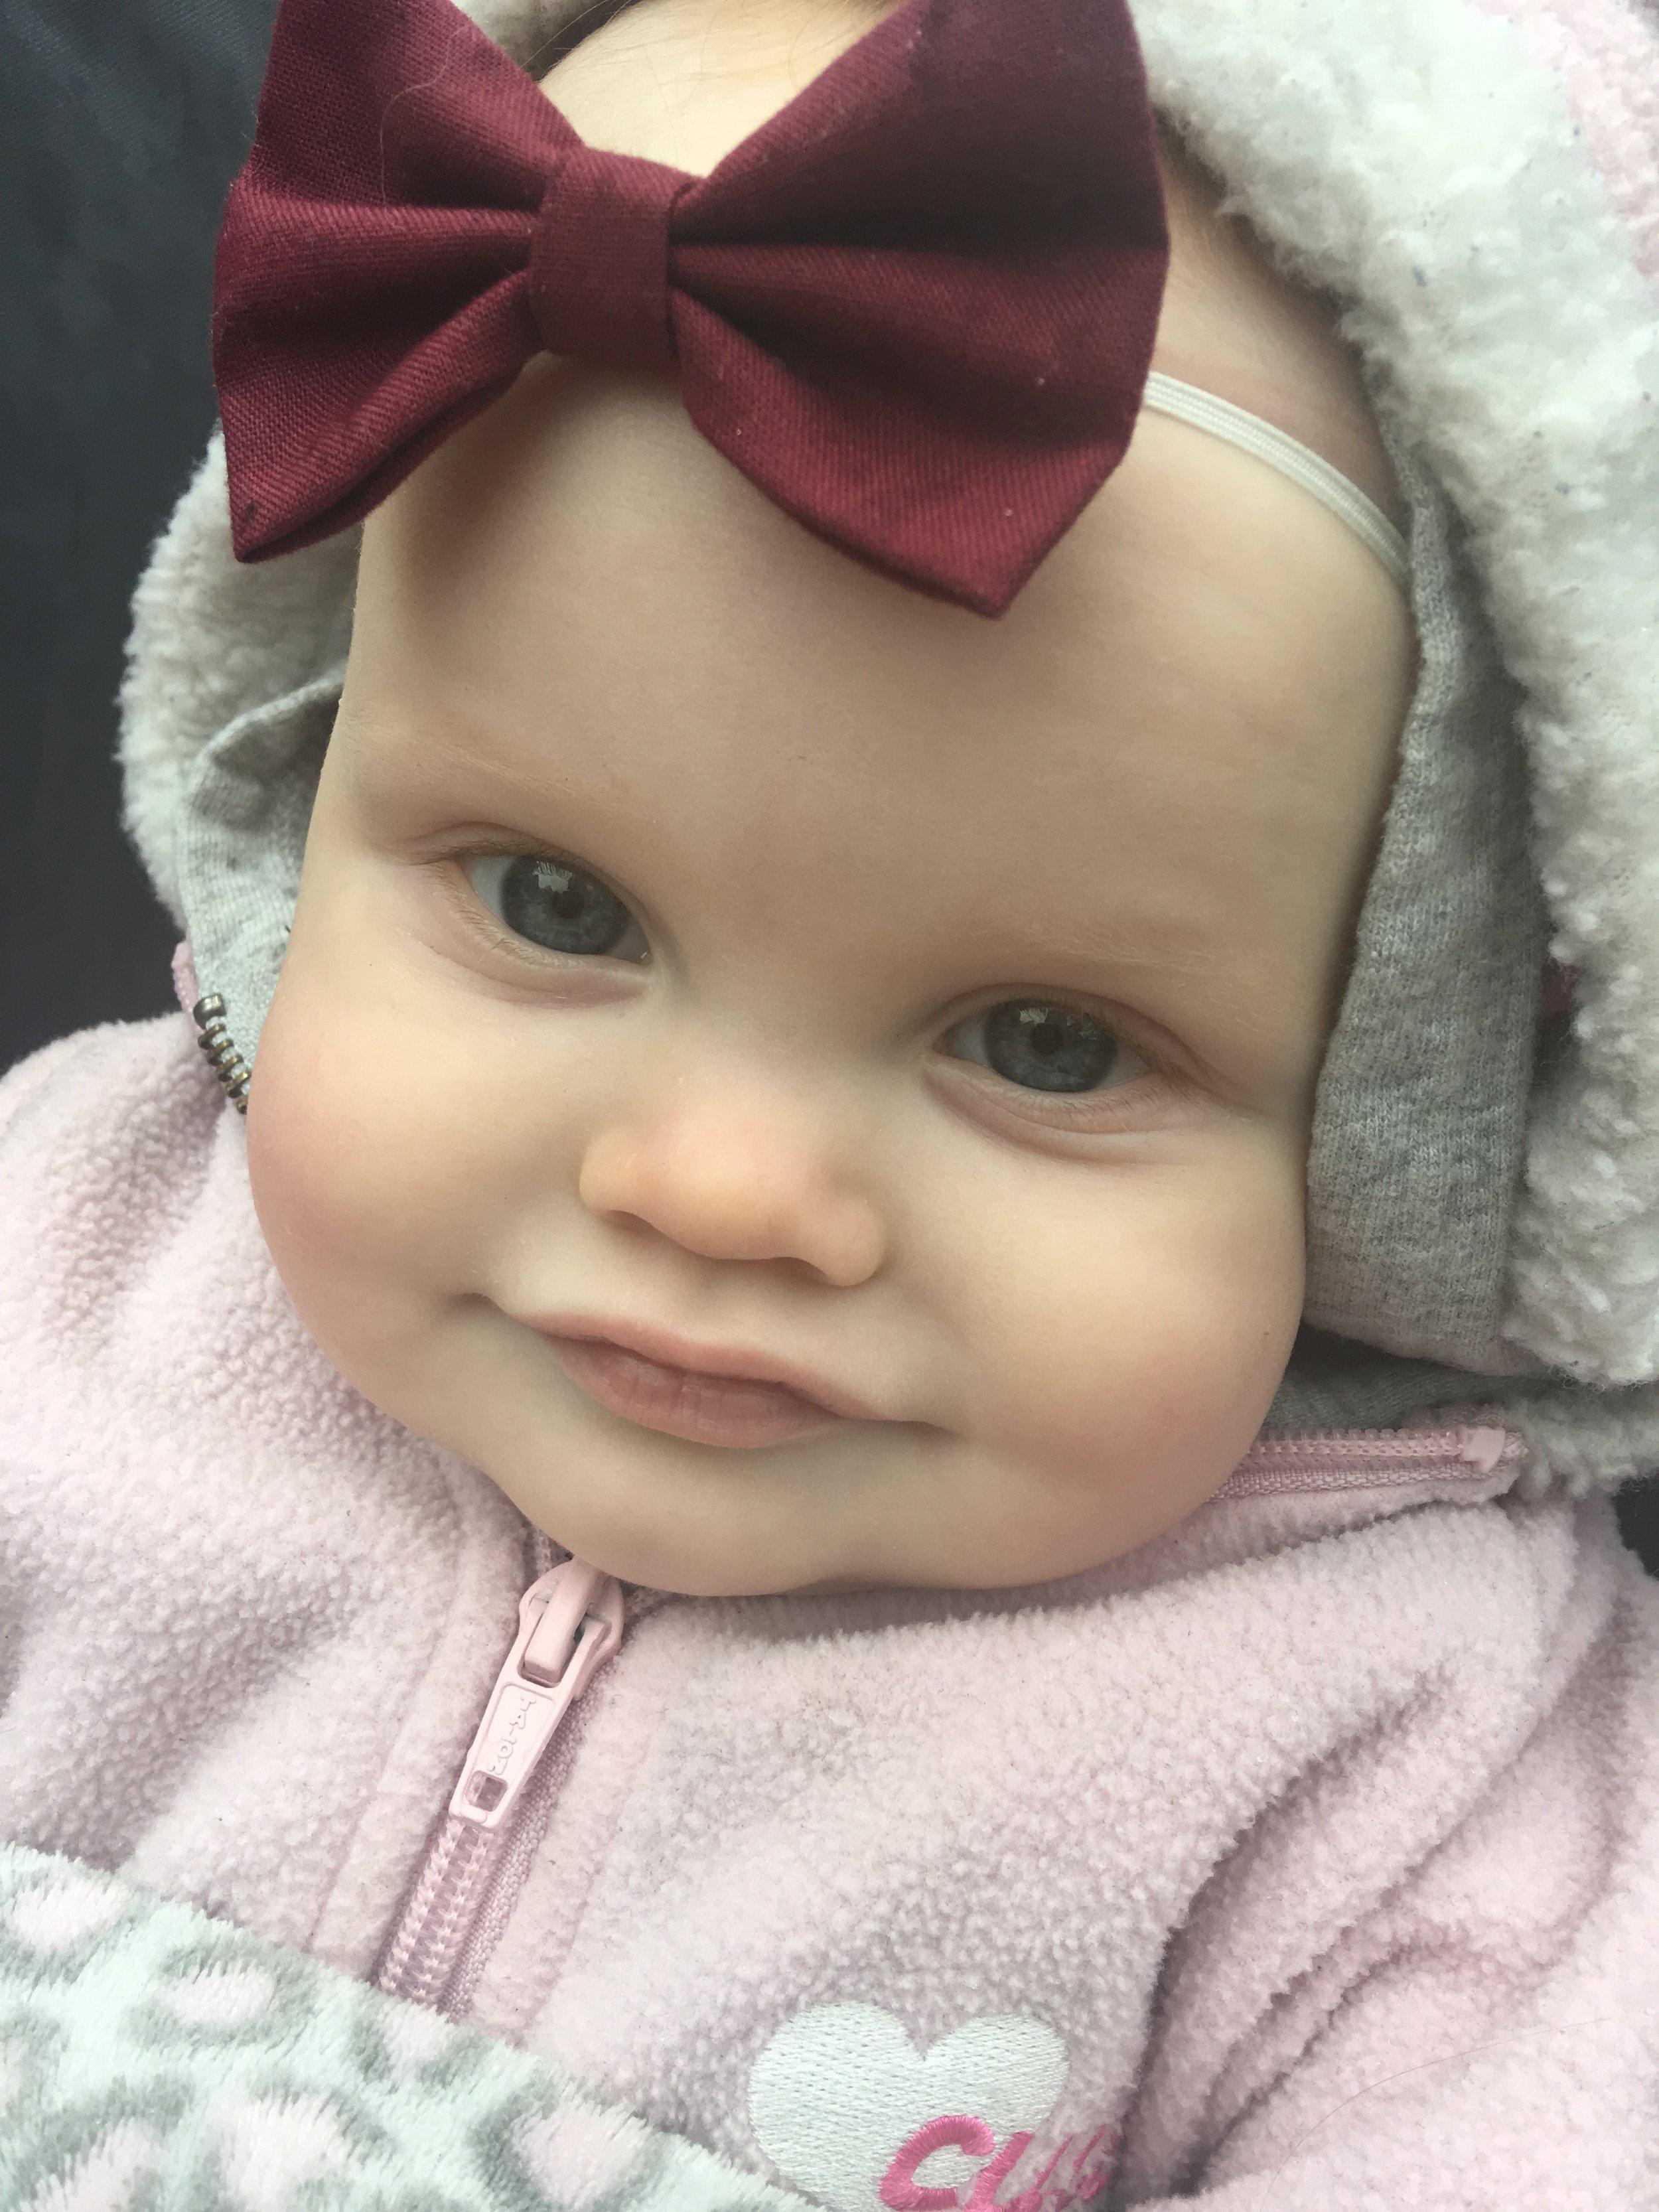 Just the prettiest little lady